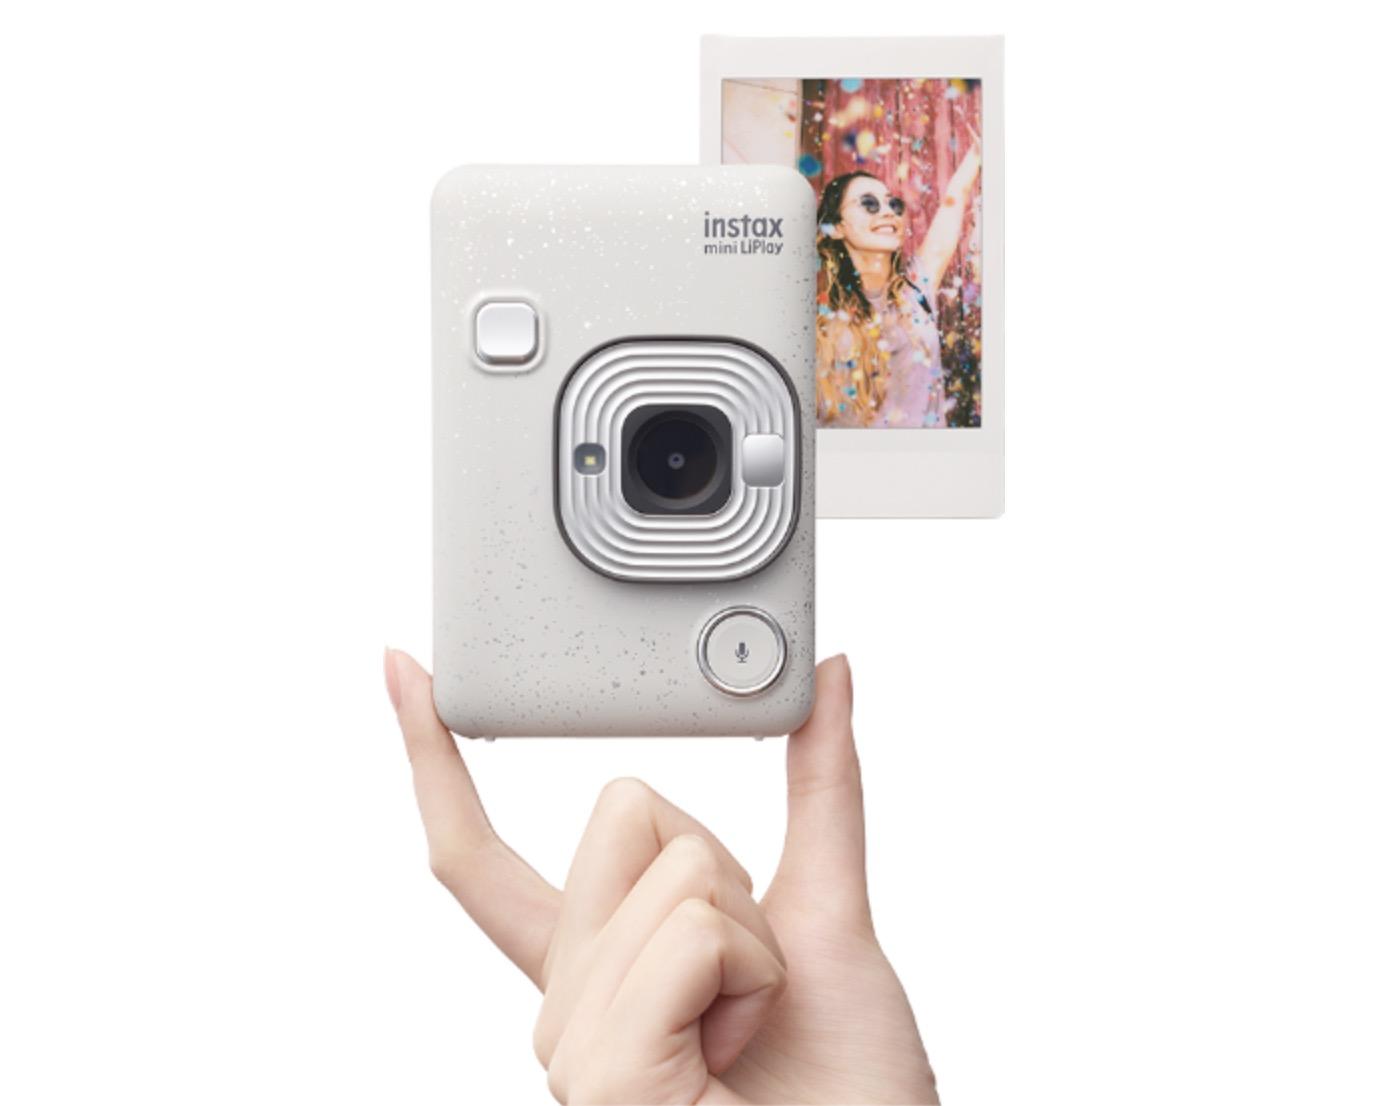 Fujifilm Instax Mini LiPlay can play sound that's printed